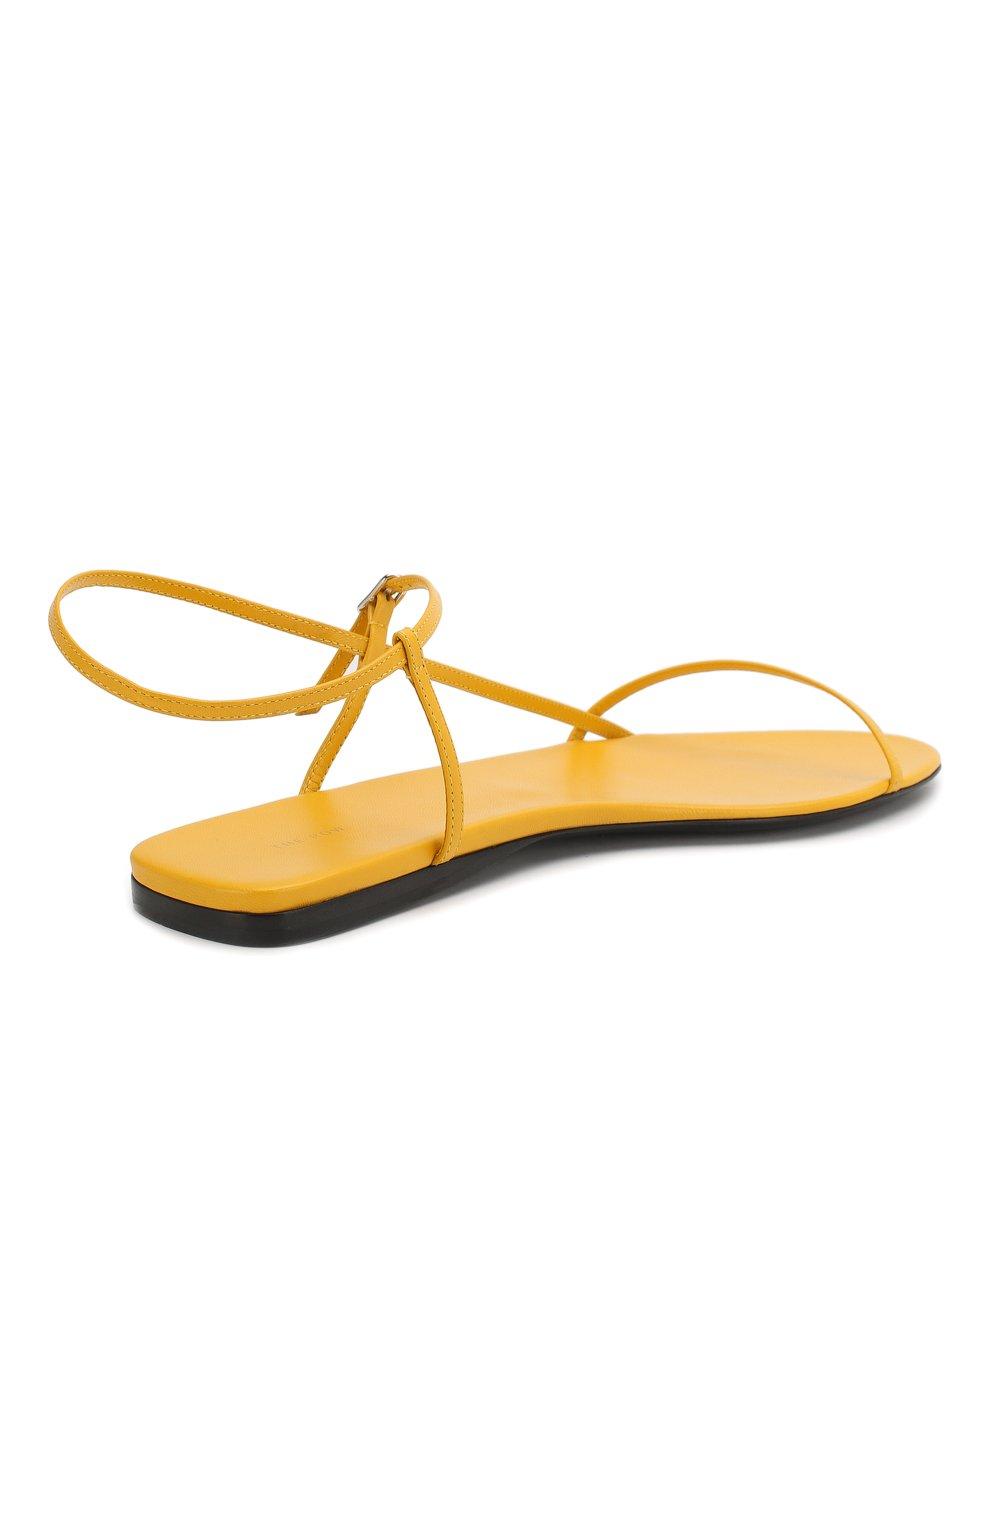 Женские кожаные сандалии bare THE ROW желтого цвета, арт. F1136-L35   Фото 4